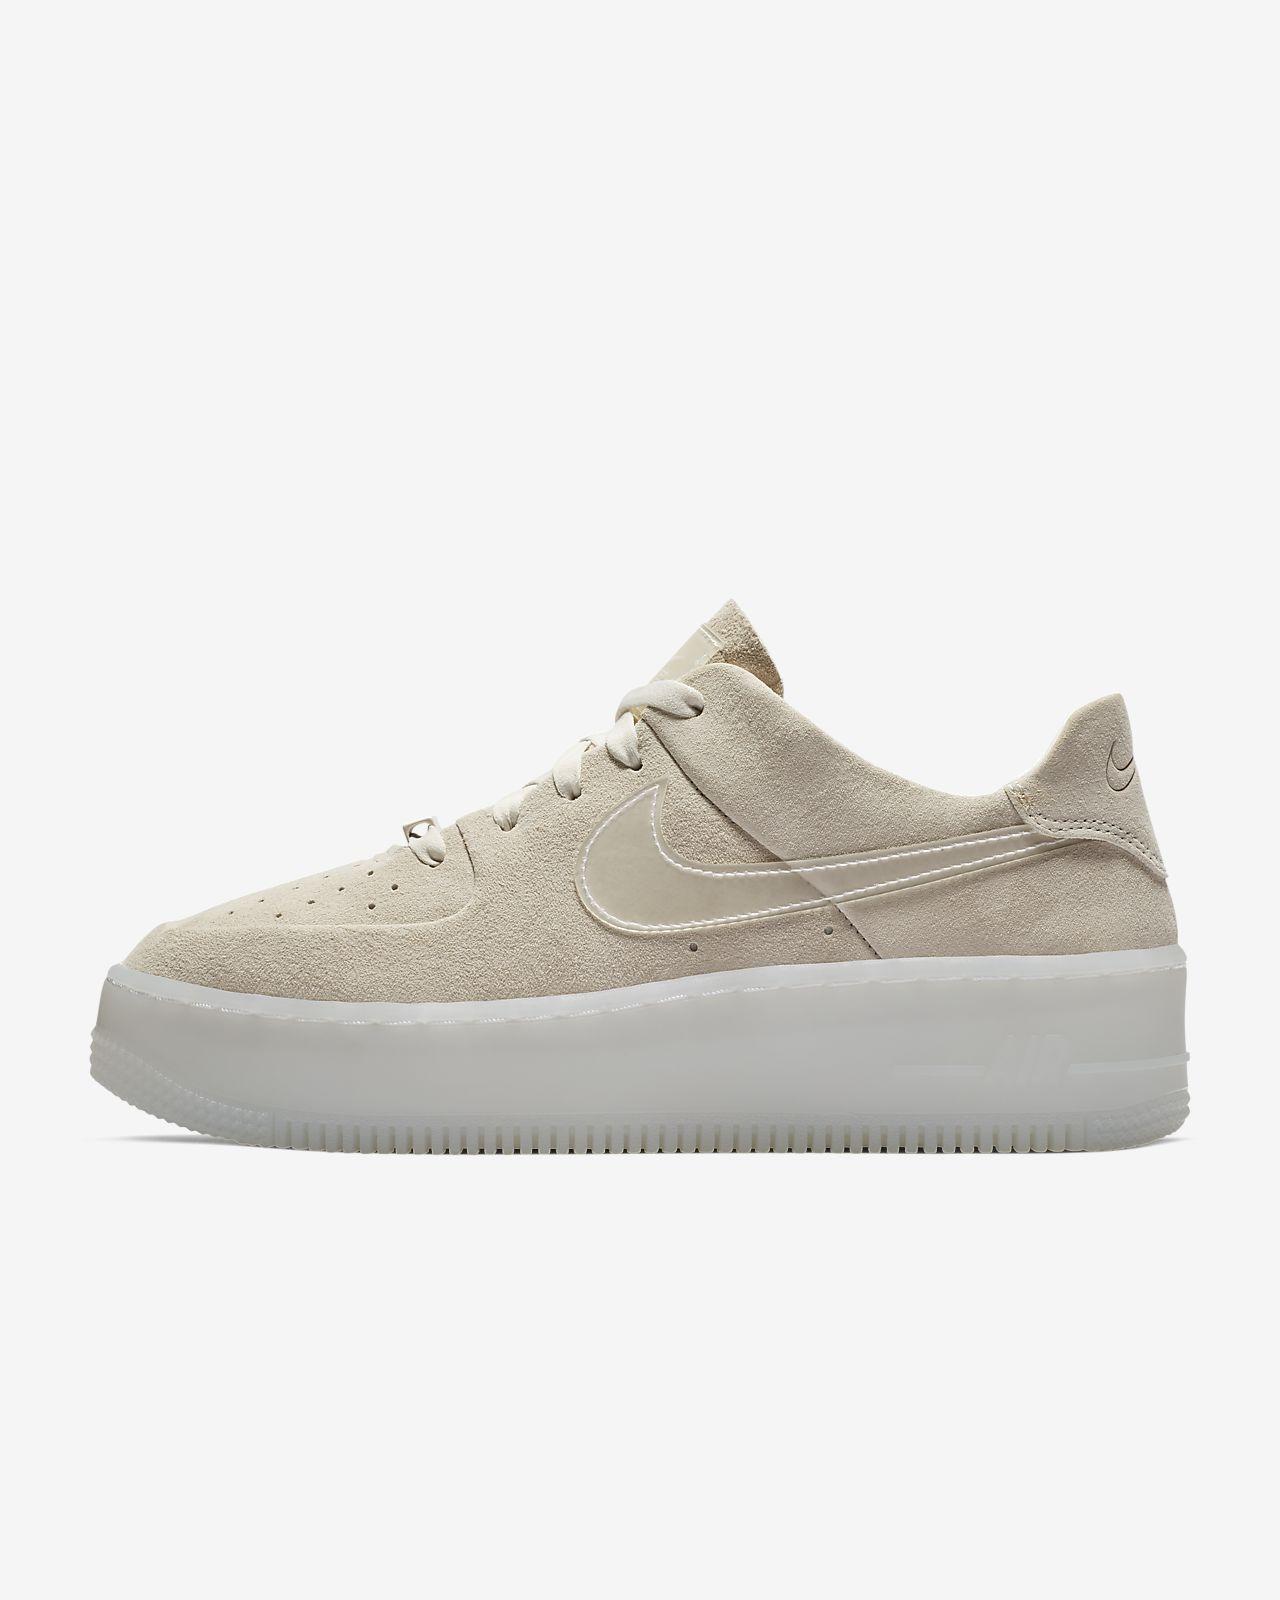 best sneakers da942 04364 Dámská bota Nike Air Force 1 Sage Low LX